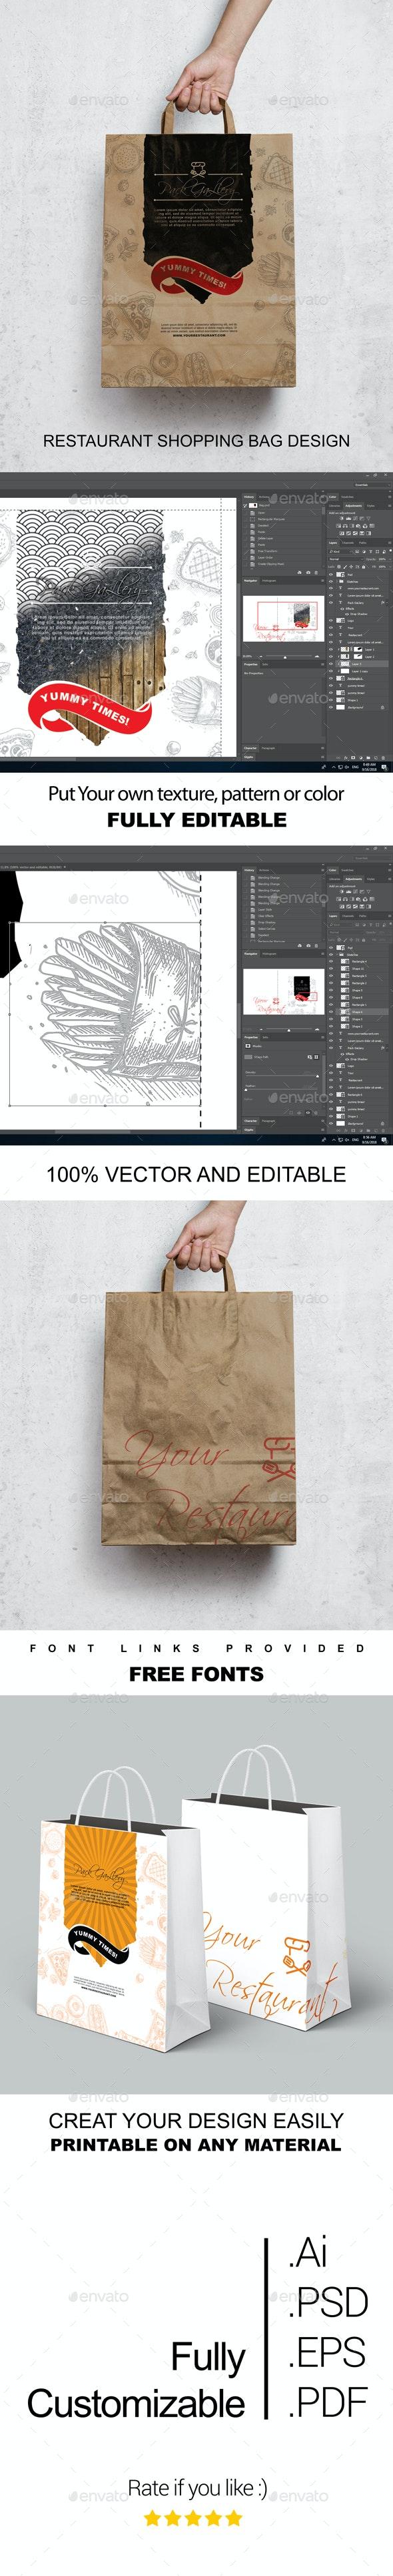 Restaurant Hand Bag Design Template - Miscellaneous Print Templates